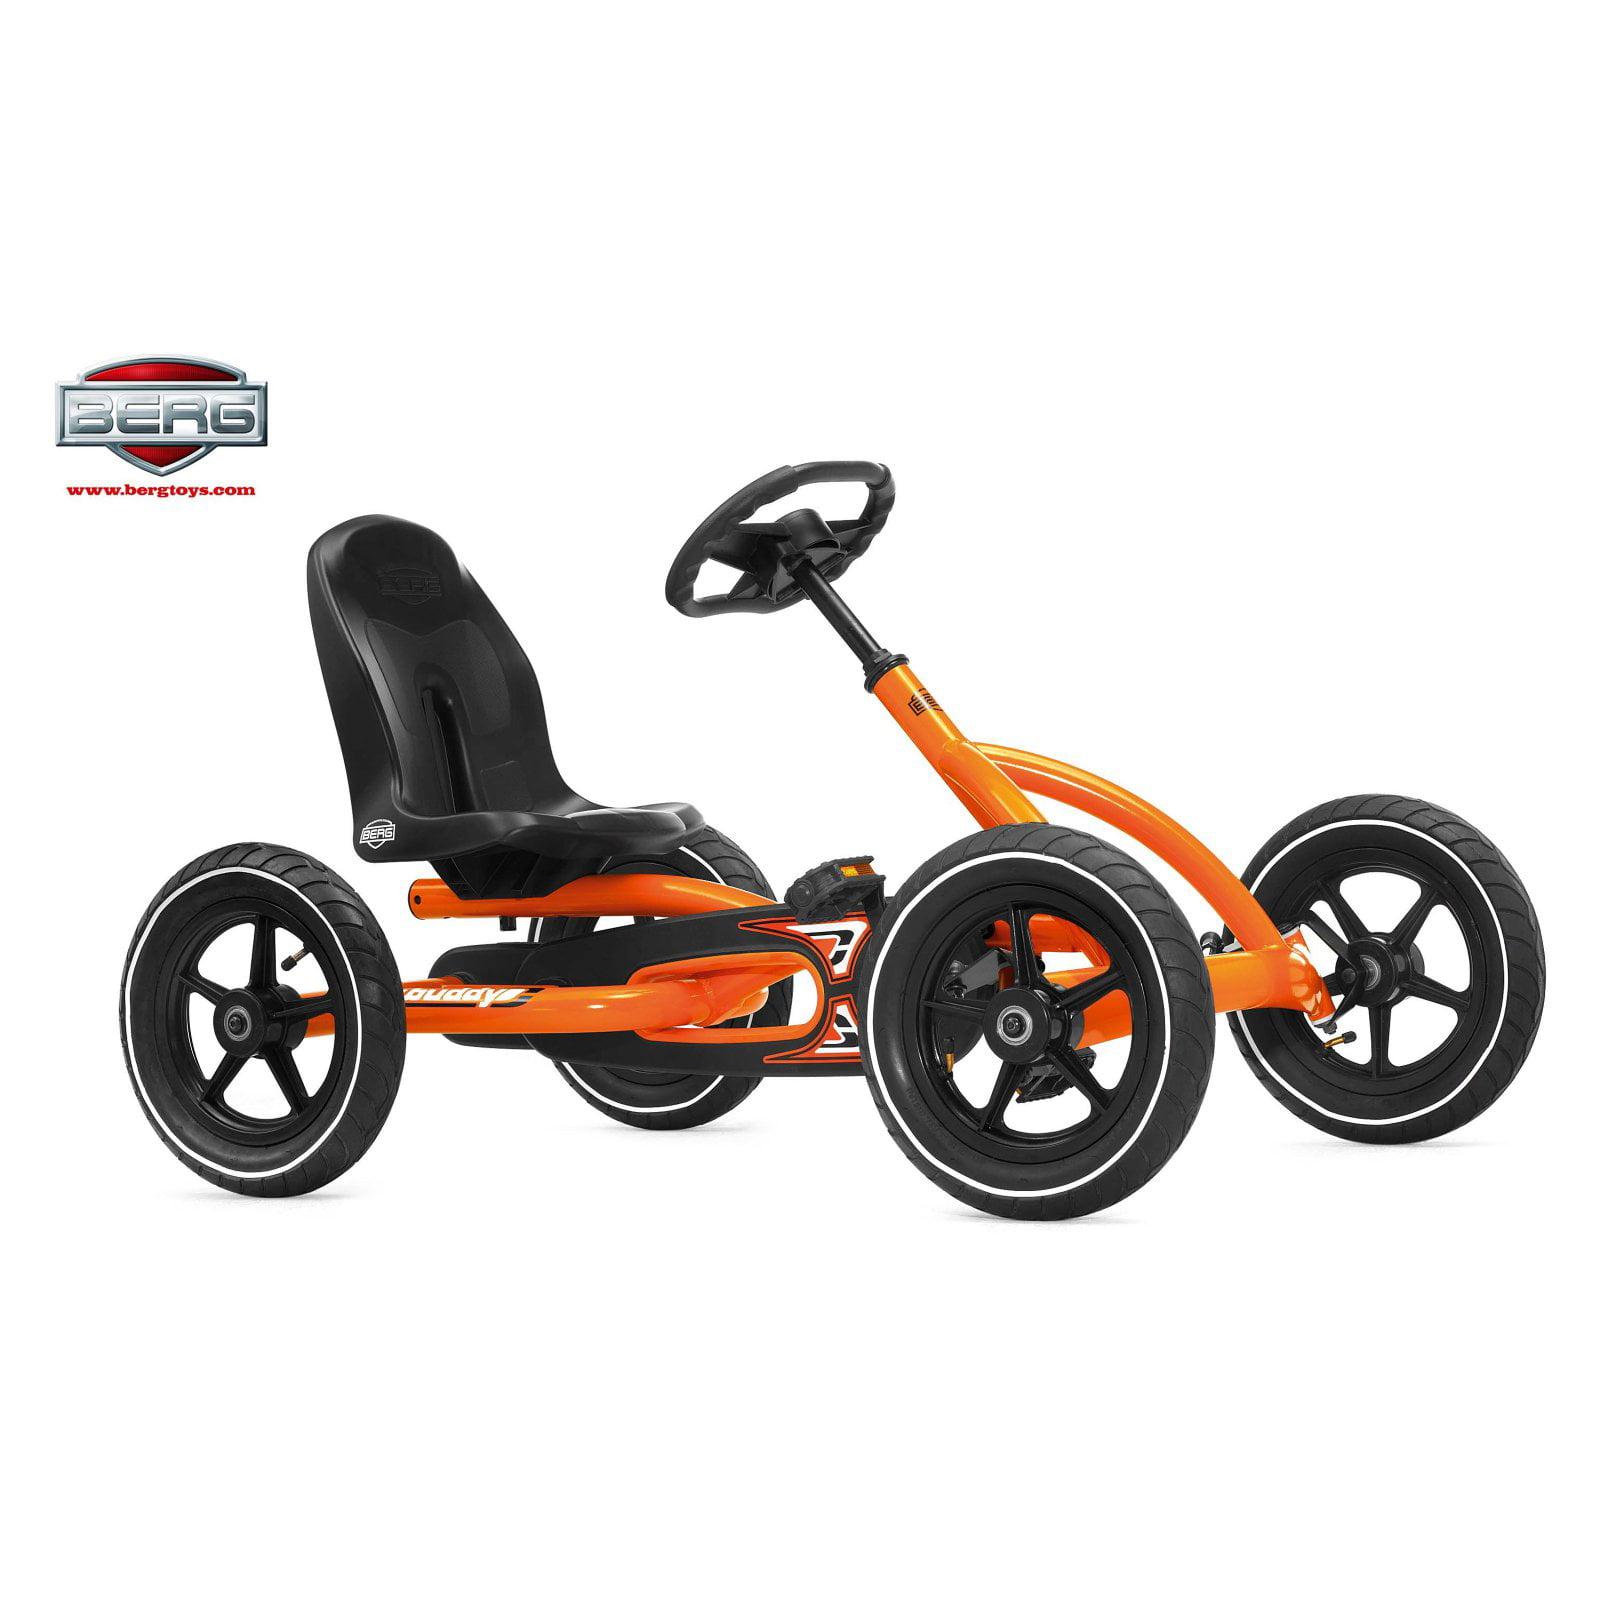 Berg USA Buddy Pedal Go Kart Orange by Berg USA LLC